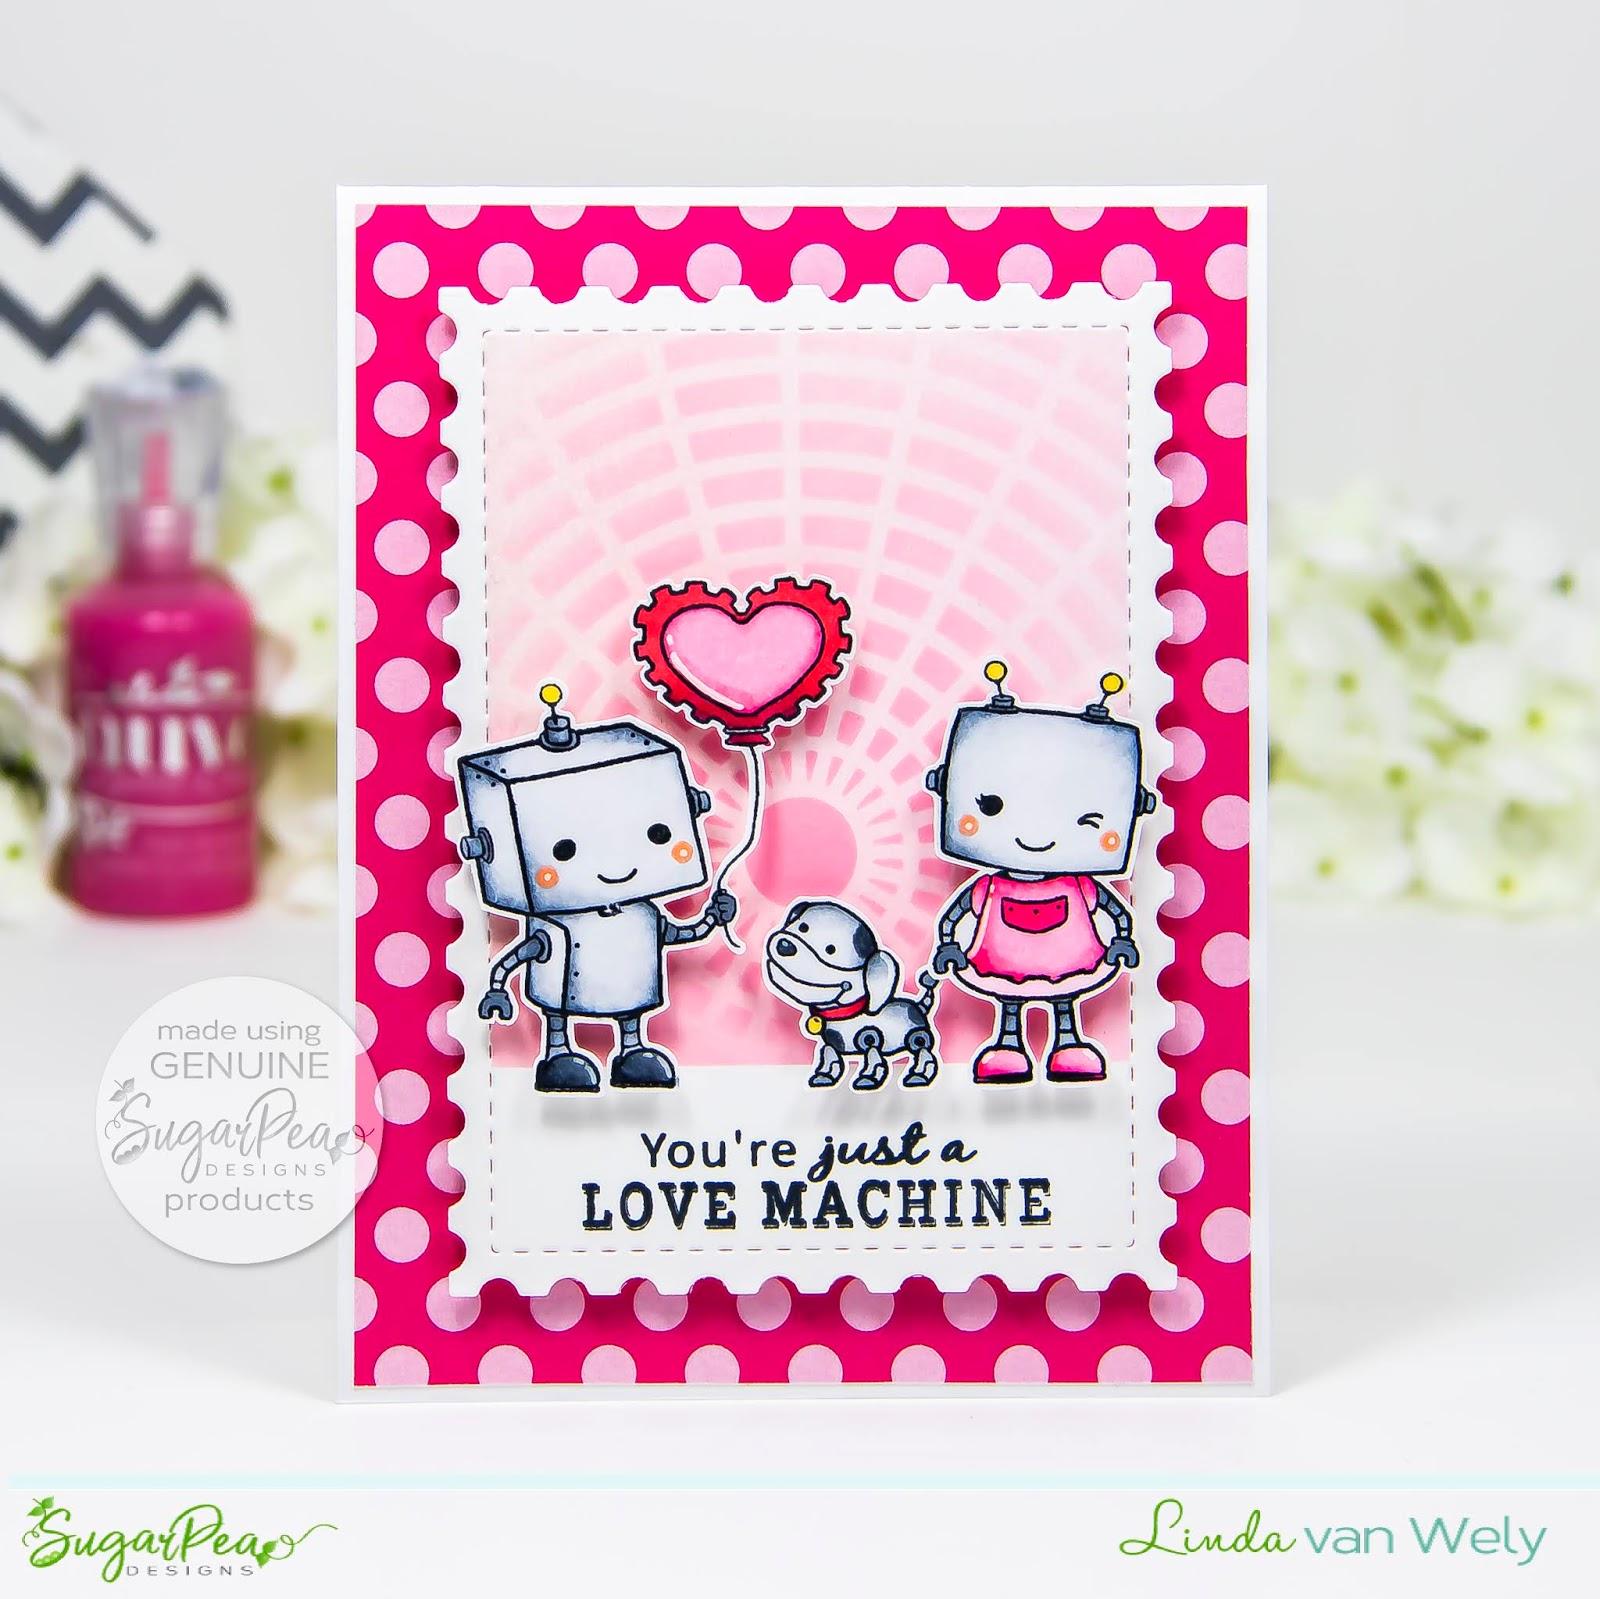 You Re Just A Love Machine Sugarpea Designs Clear Stamps